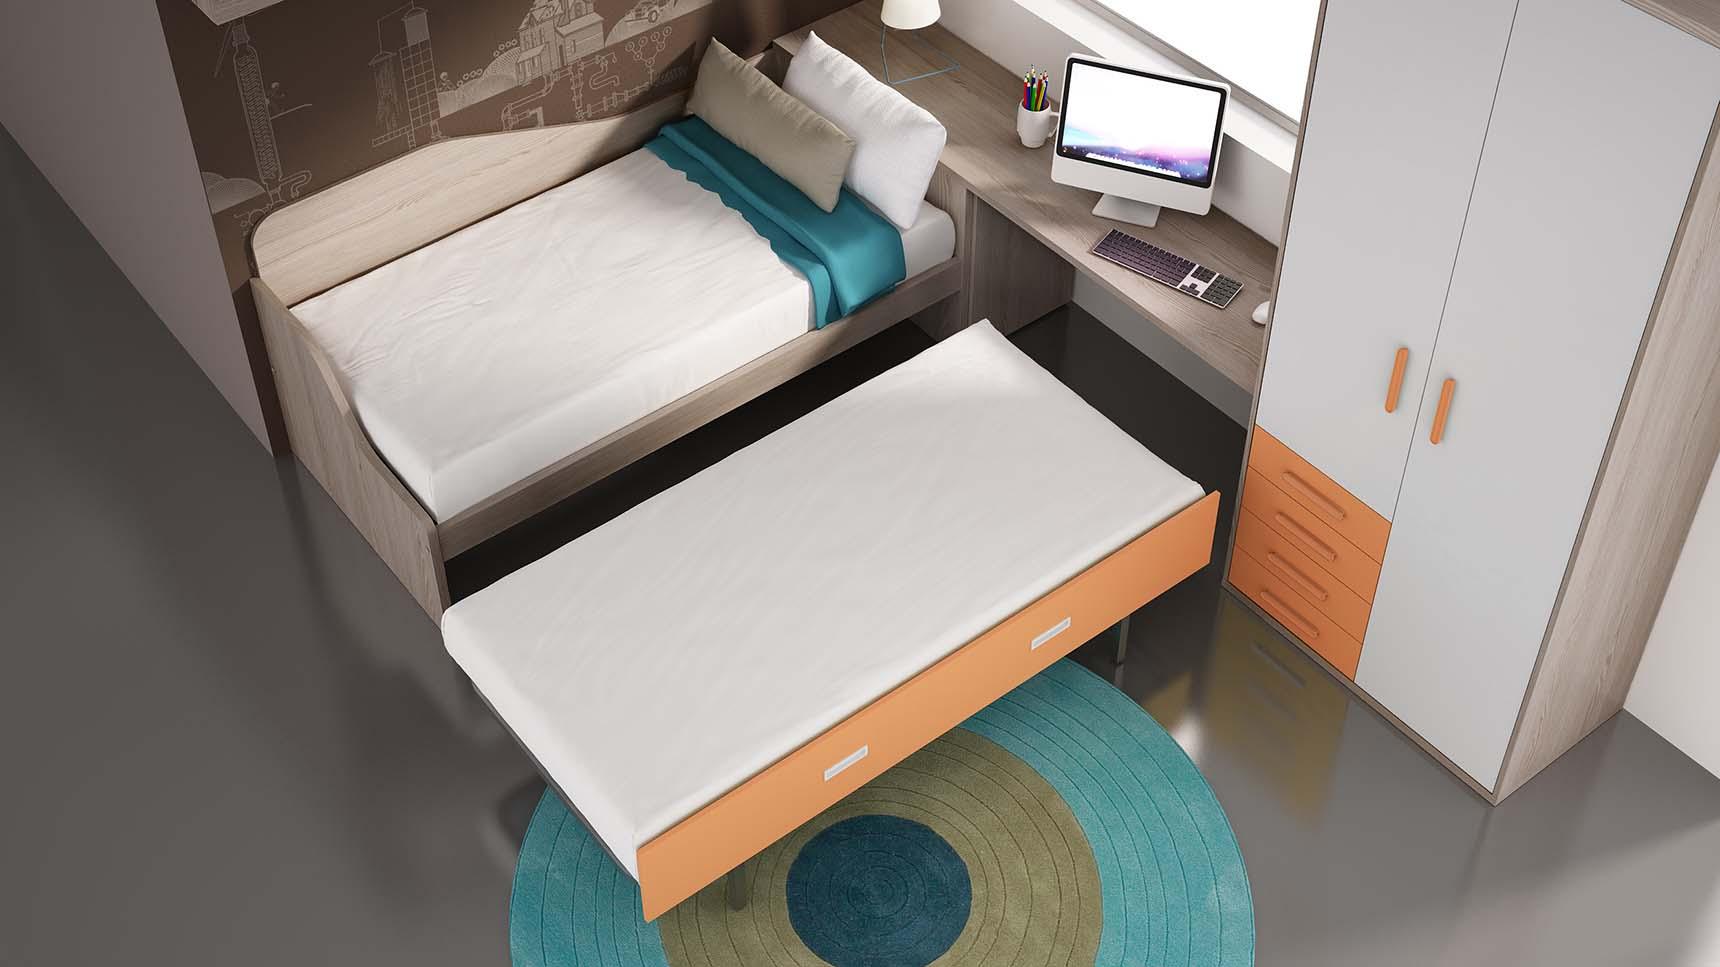 cama nido auxiliar ih032